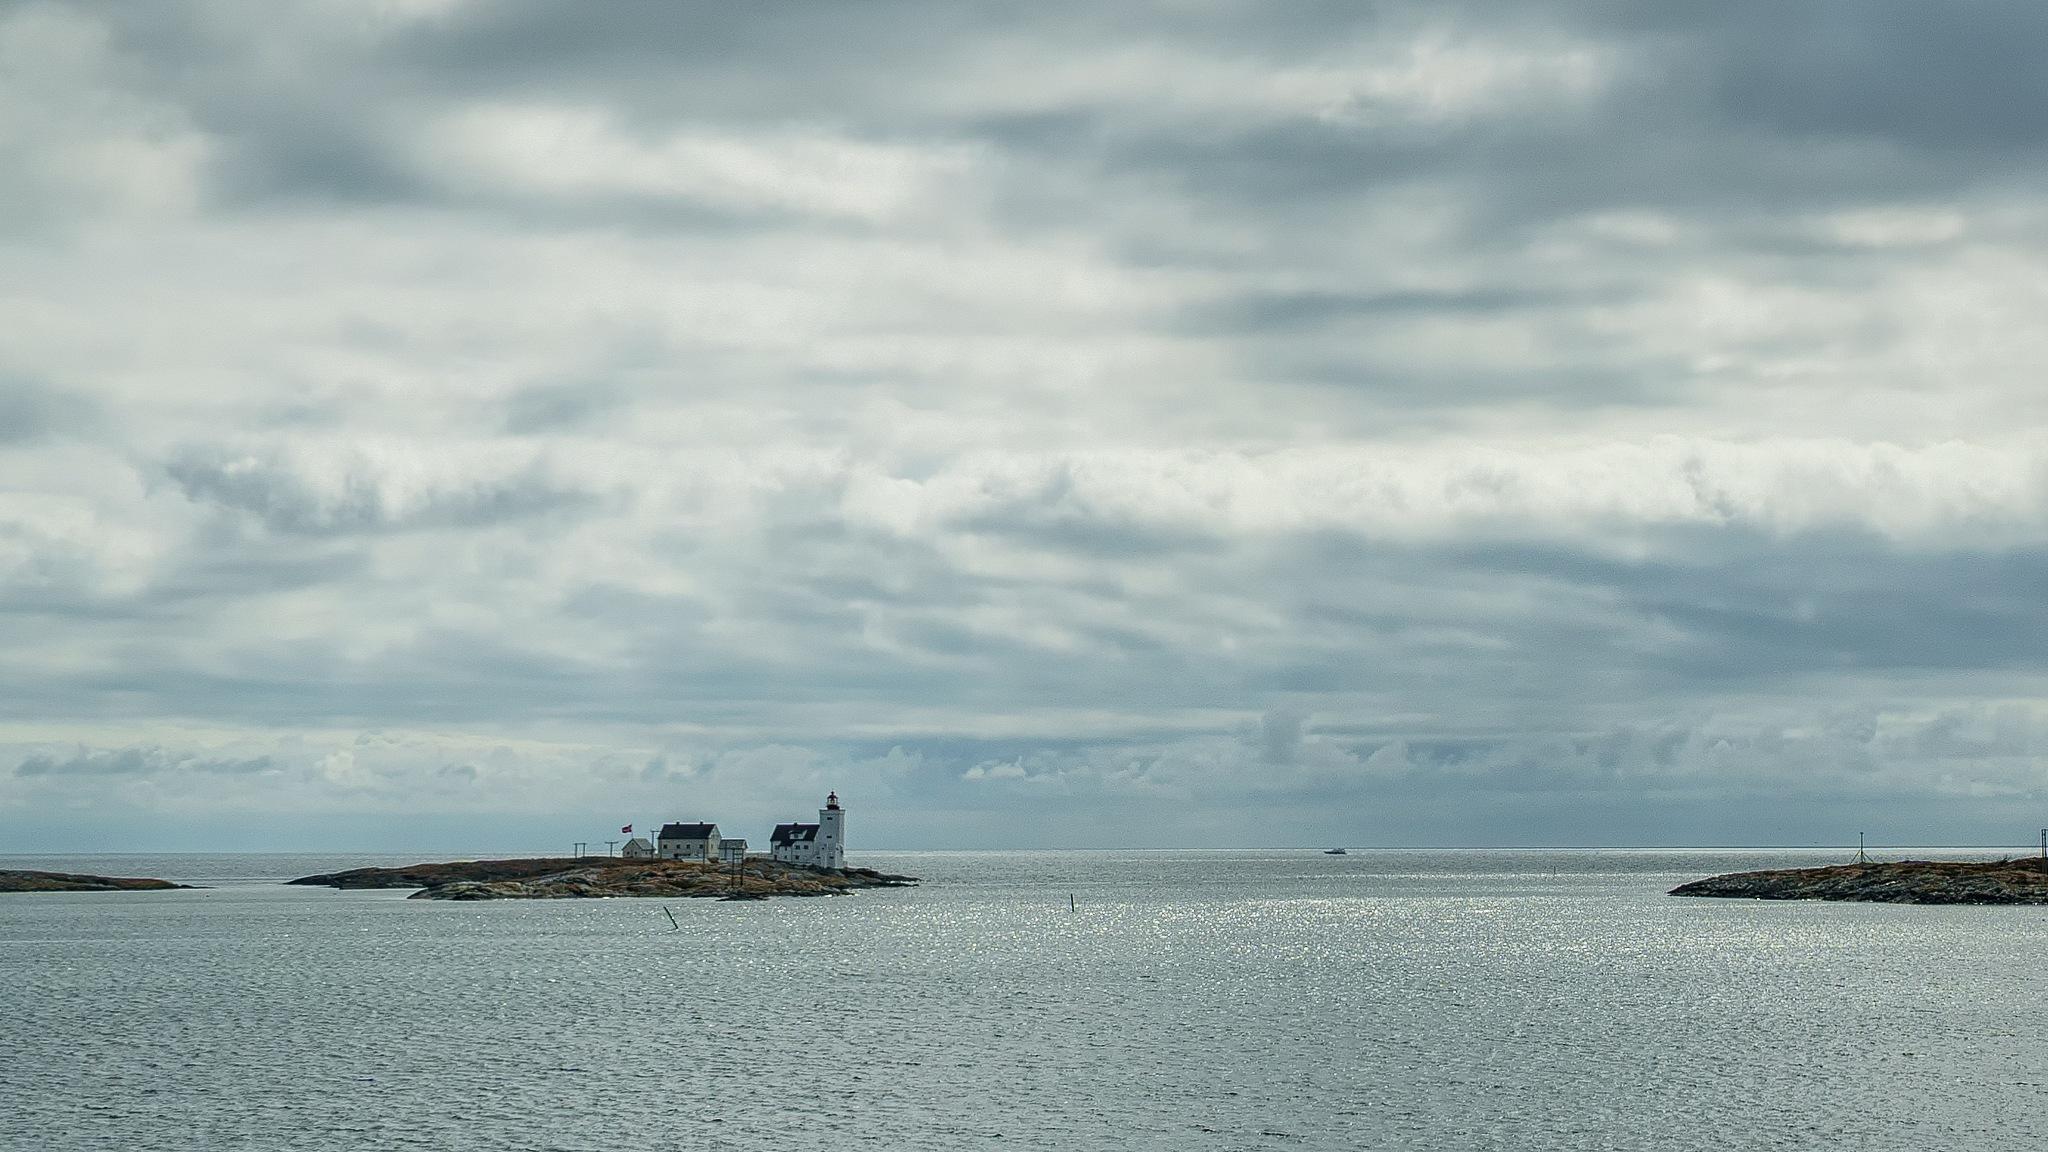 lighthouse by Jonas Gustavsson